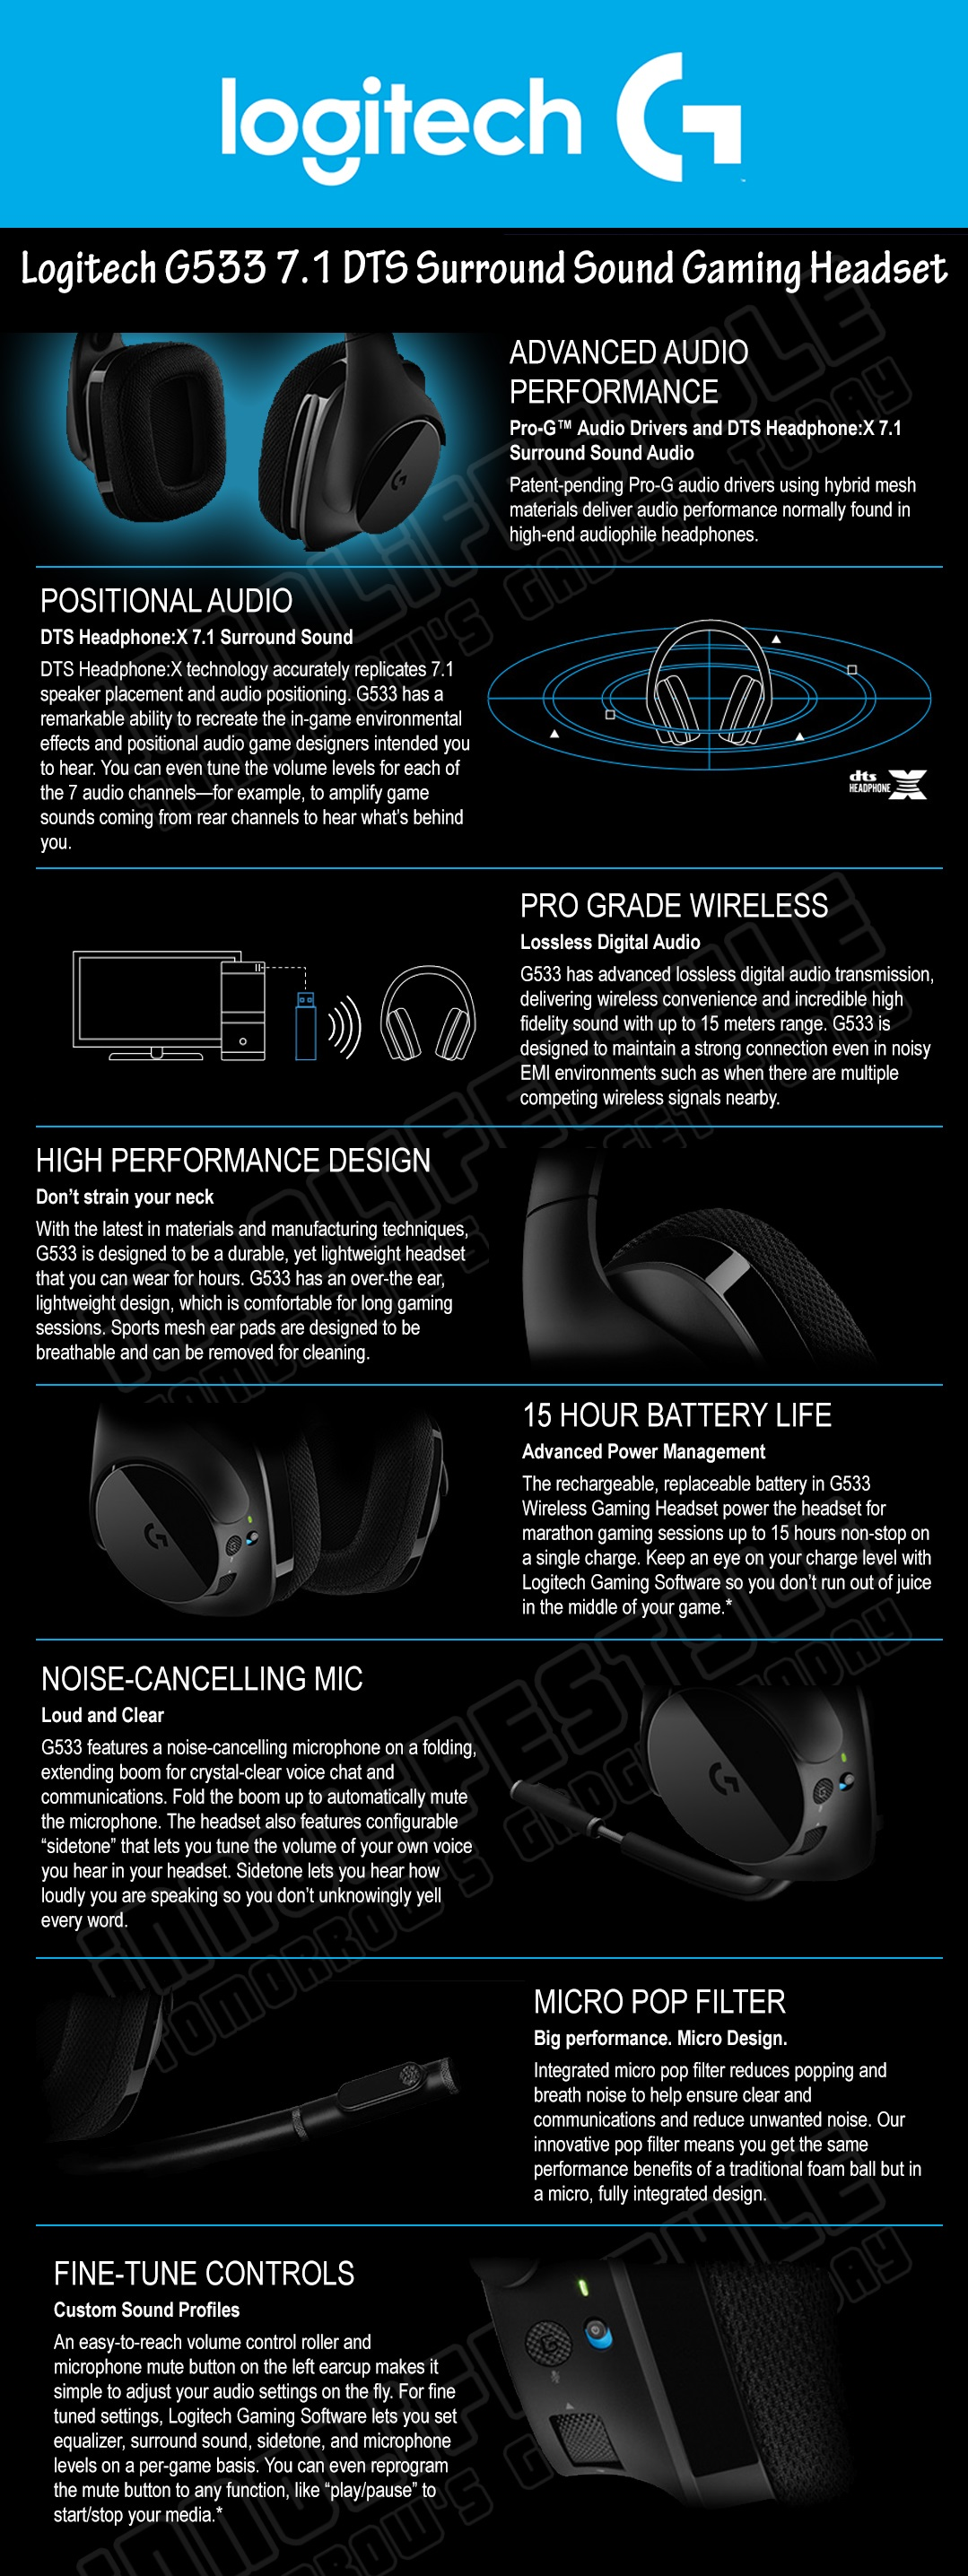 Logitech G533 DTS 7 1 Surround Gaming Headset ★2 Years Warranty★